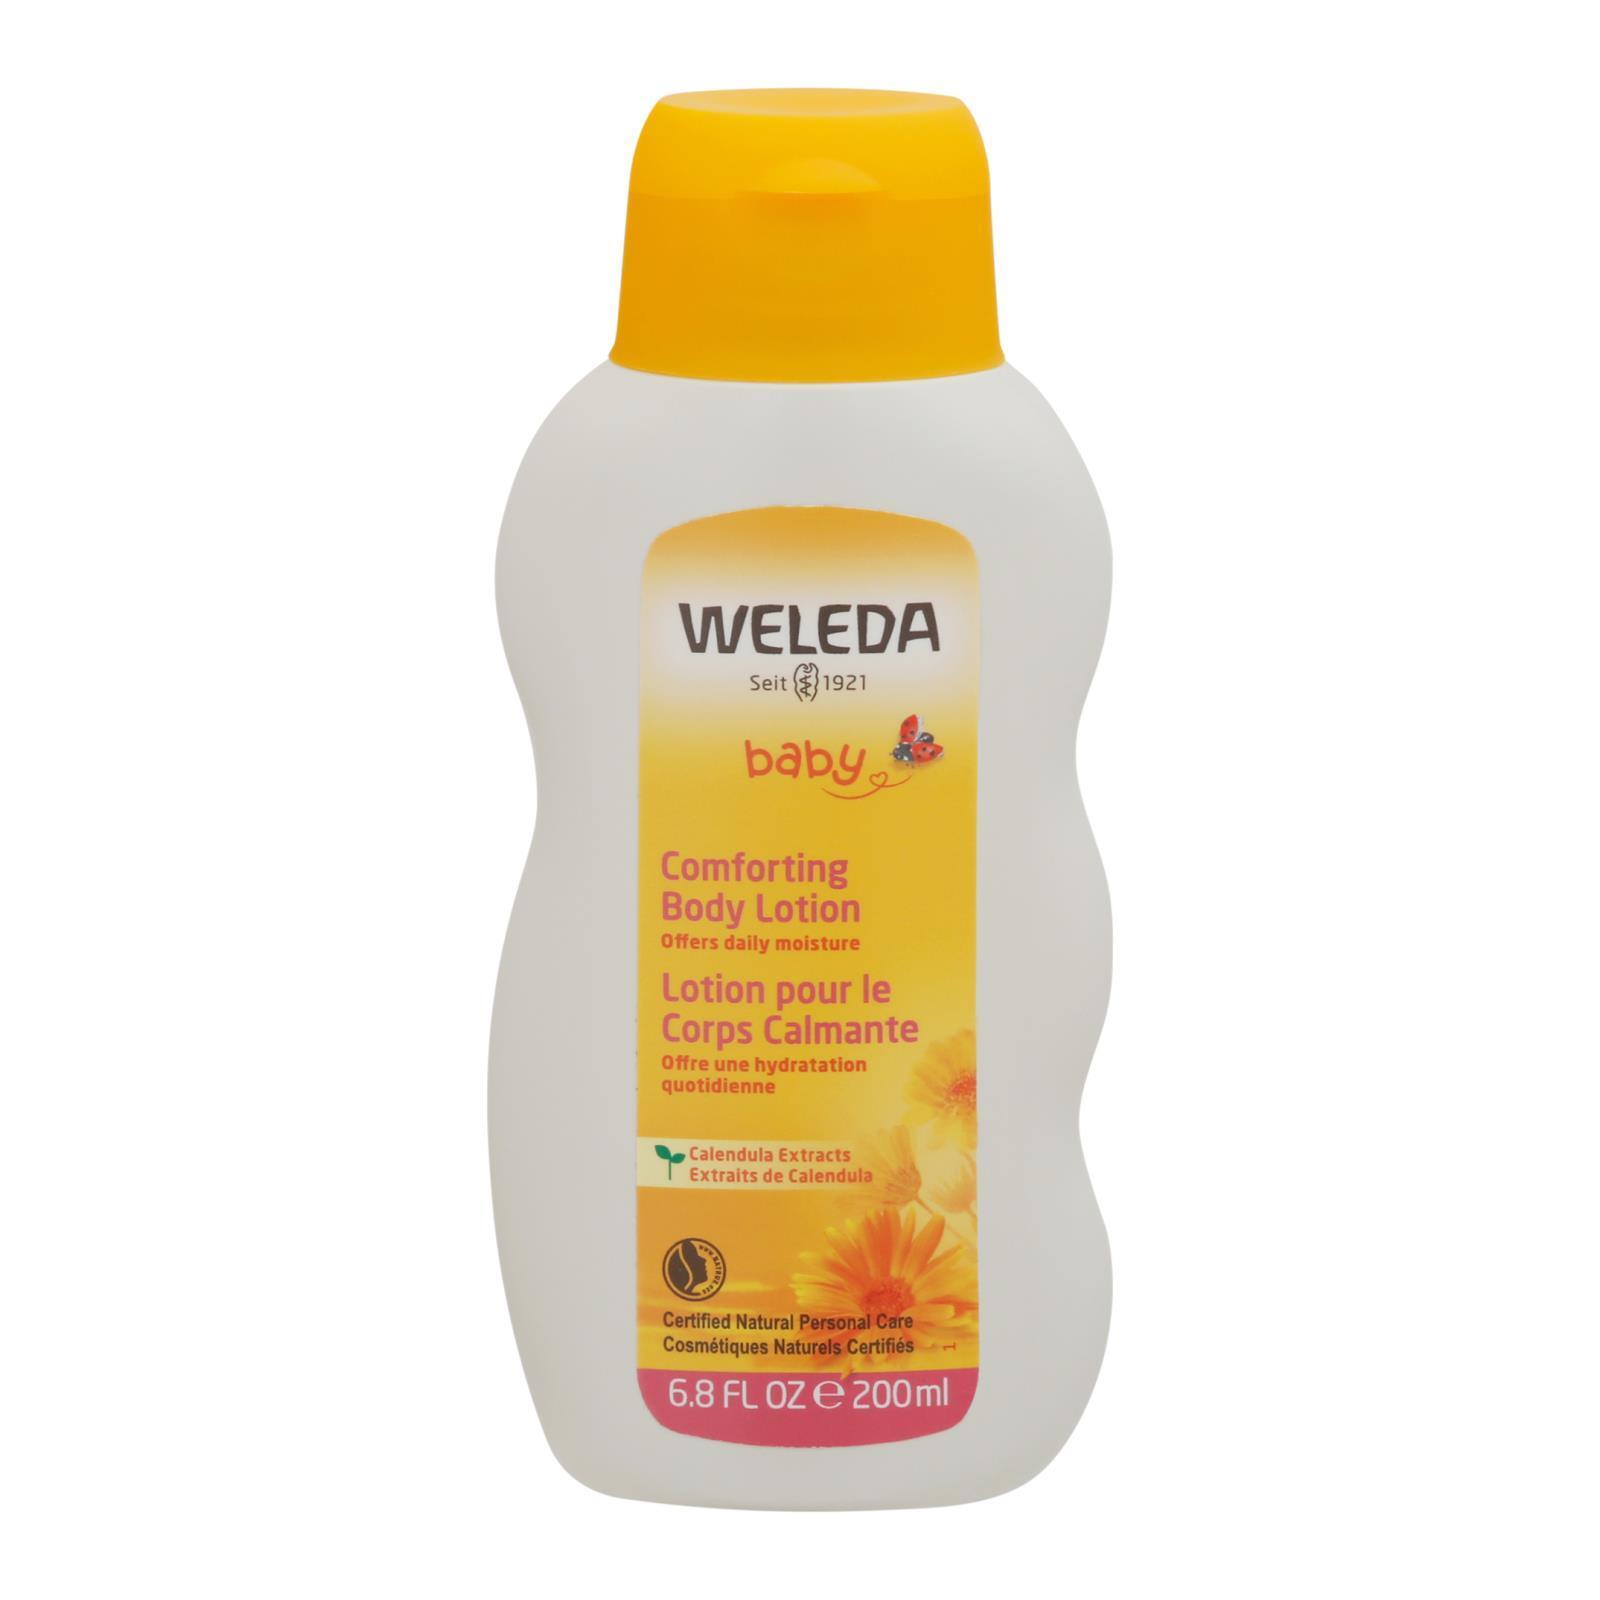 Weleda Calendula Body Lotion - 6.8 fl oz